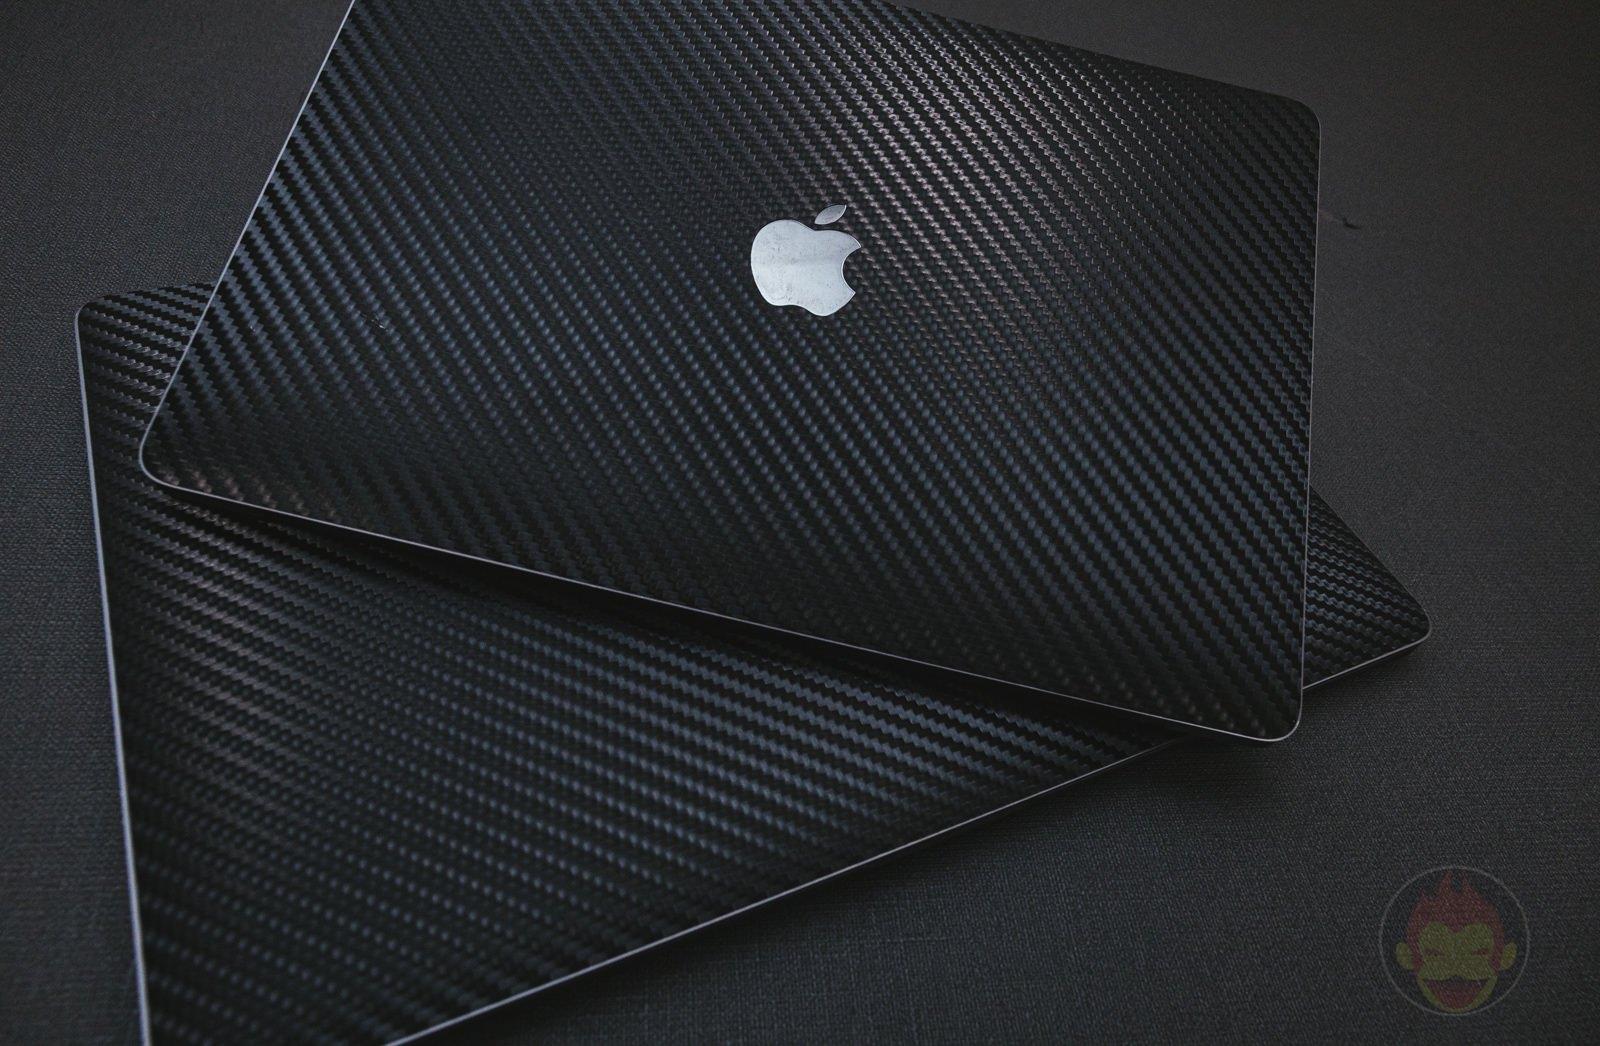 MacBook-Pro-13inch-or-15inch-2019-comparison-05.jpg